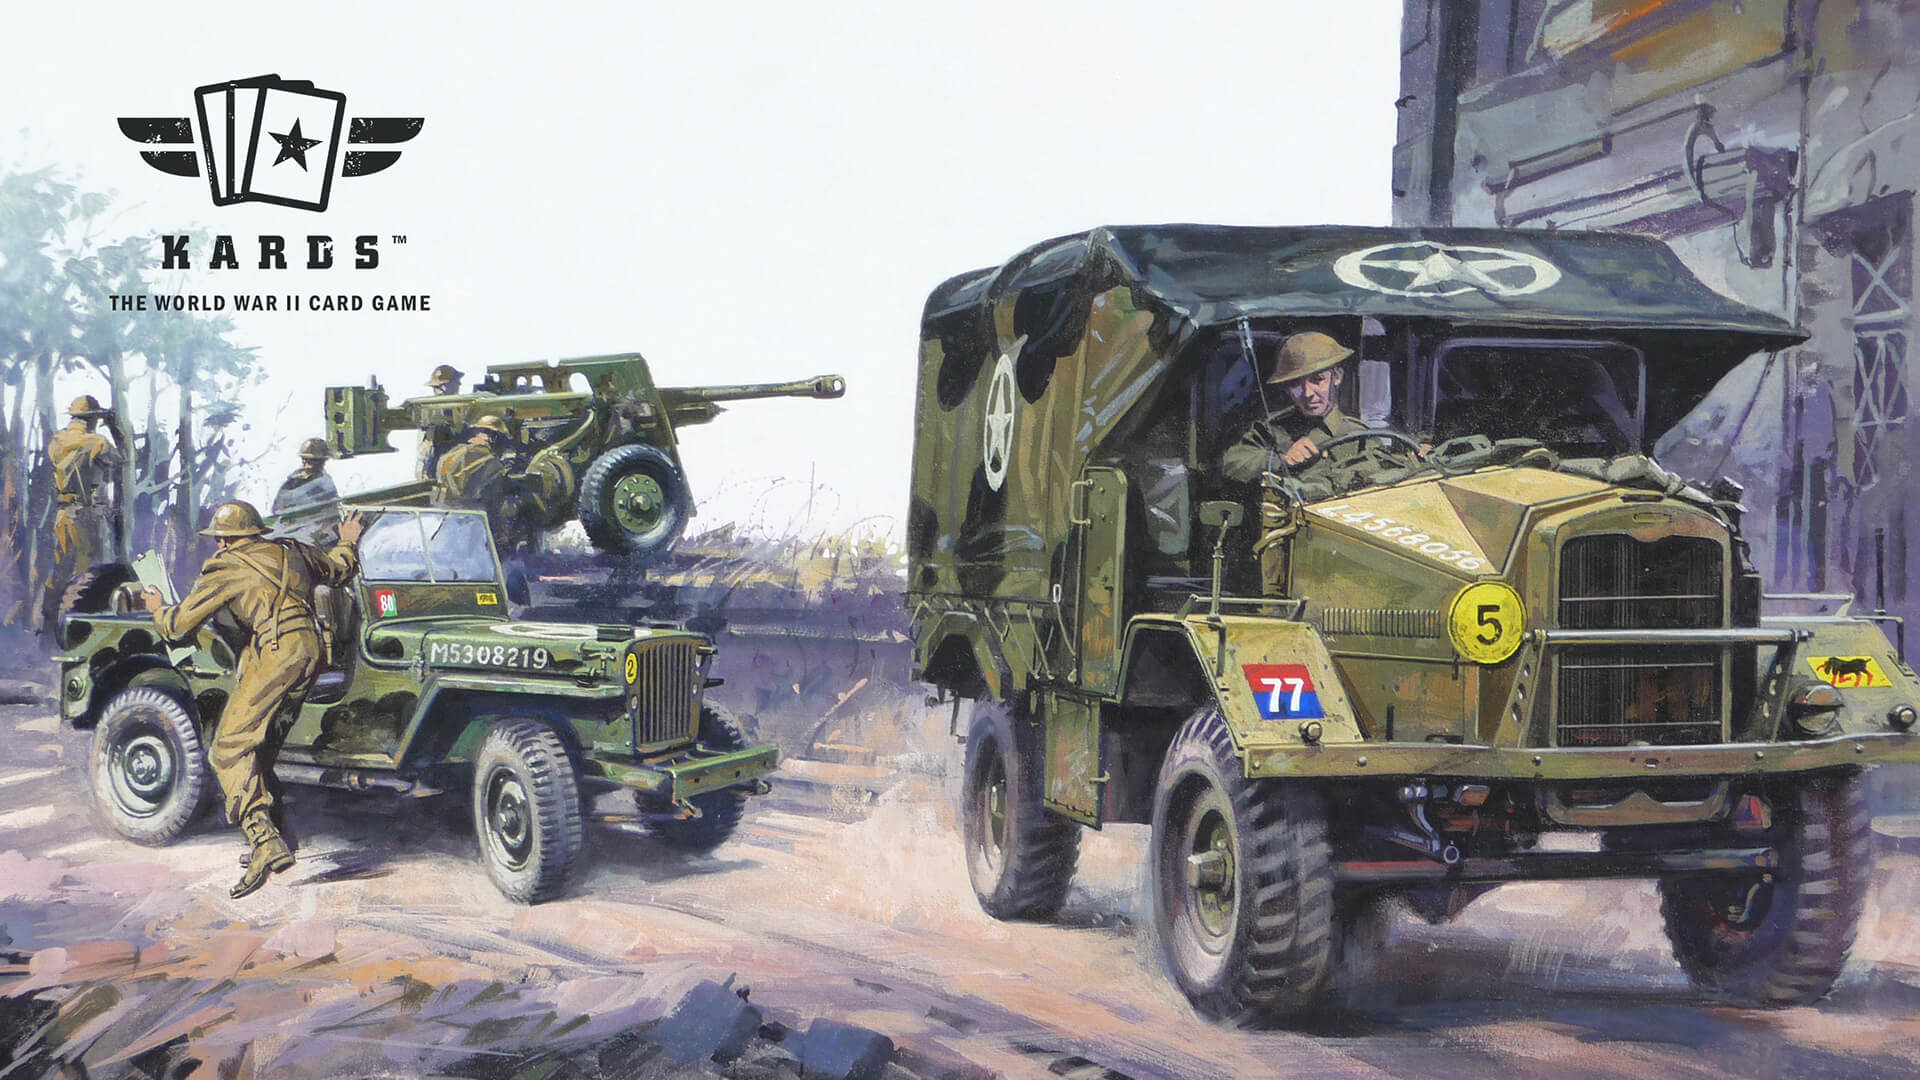 KARDS WWII CCG Review: The Art of 2D War